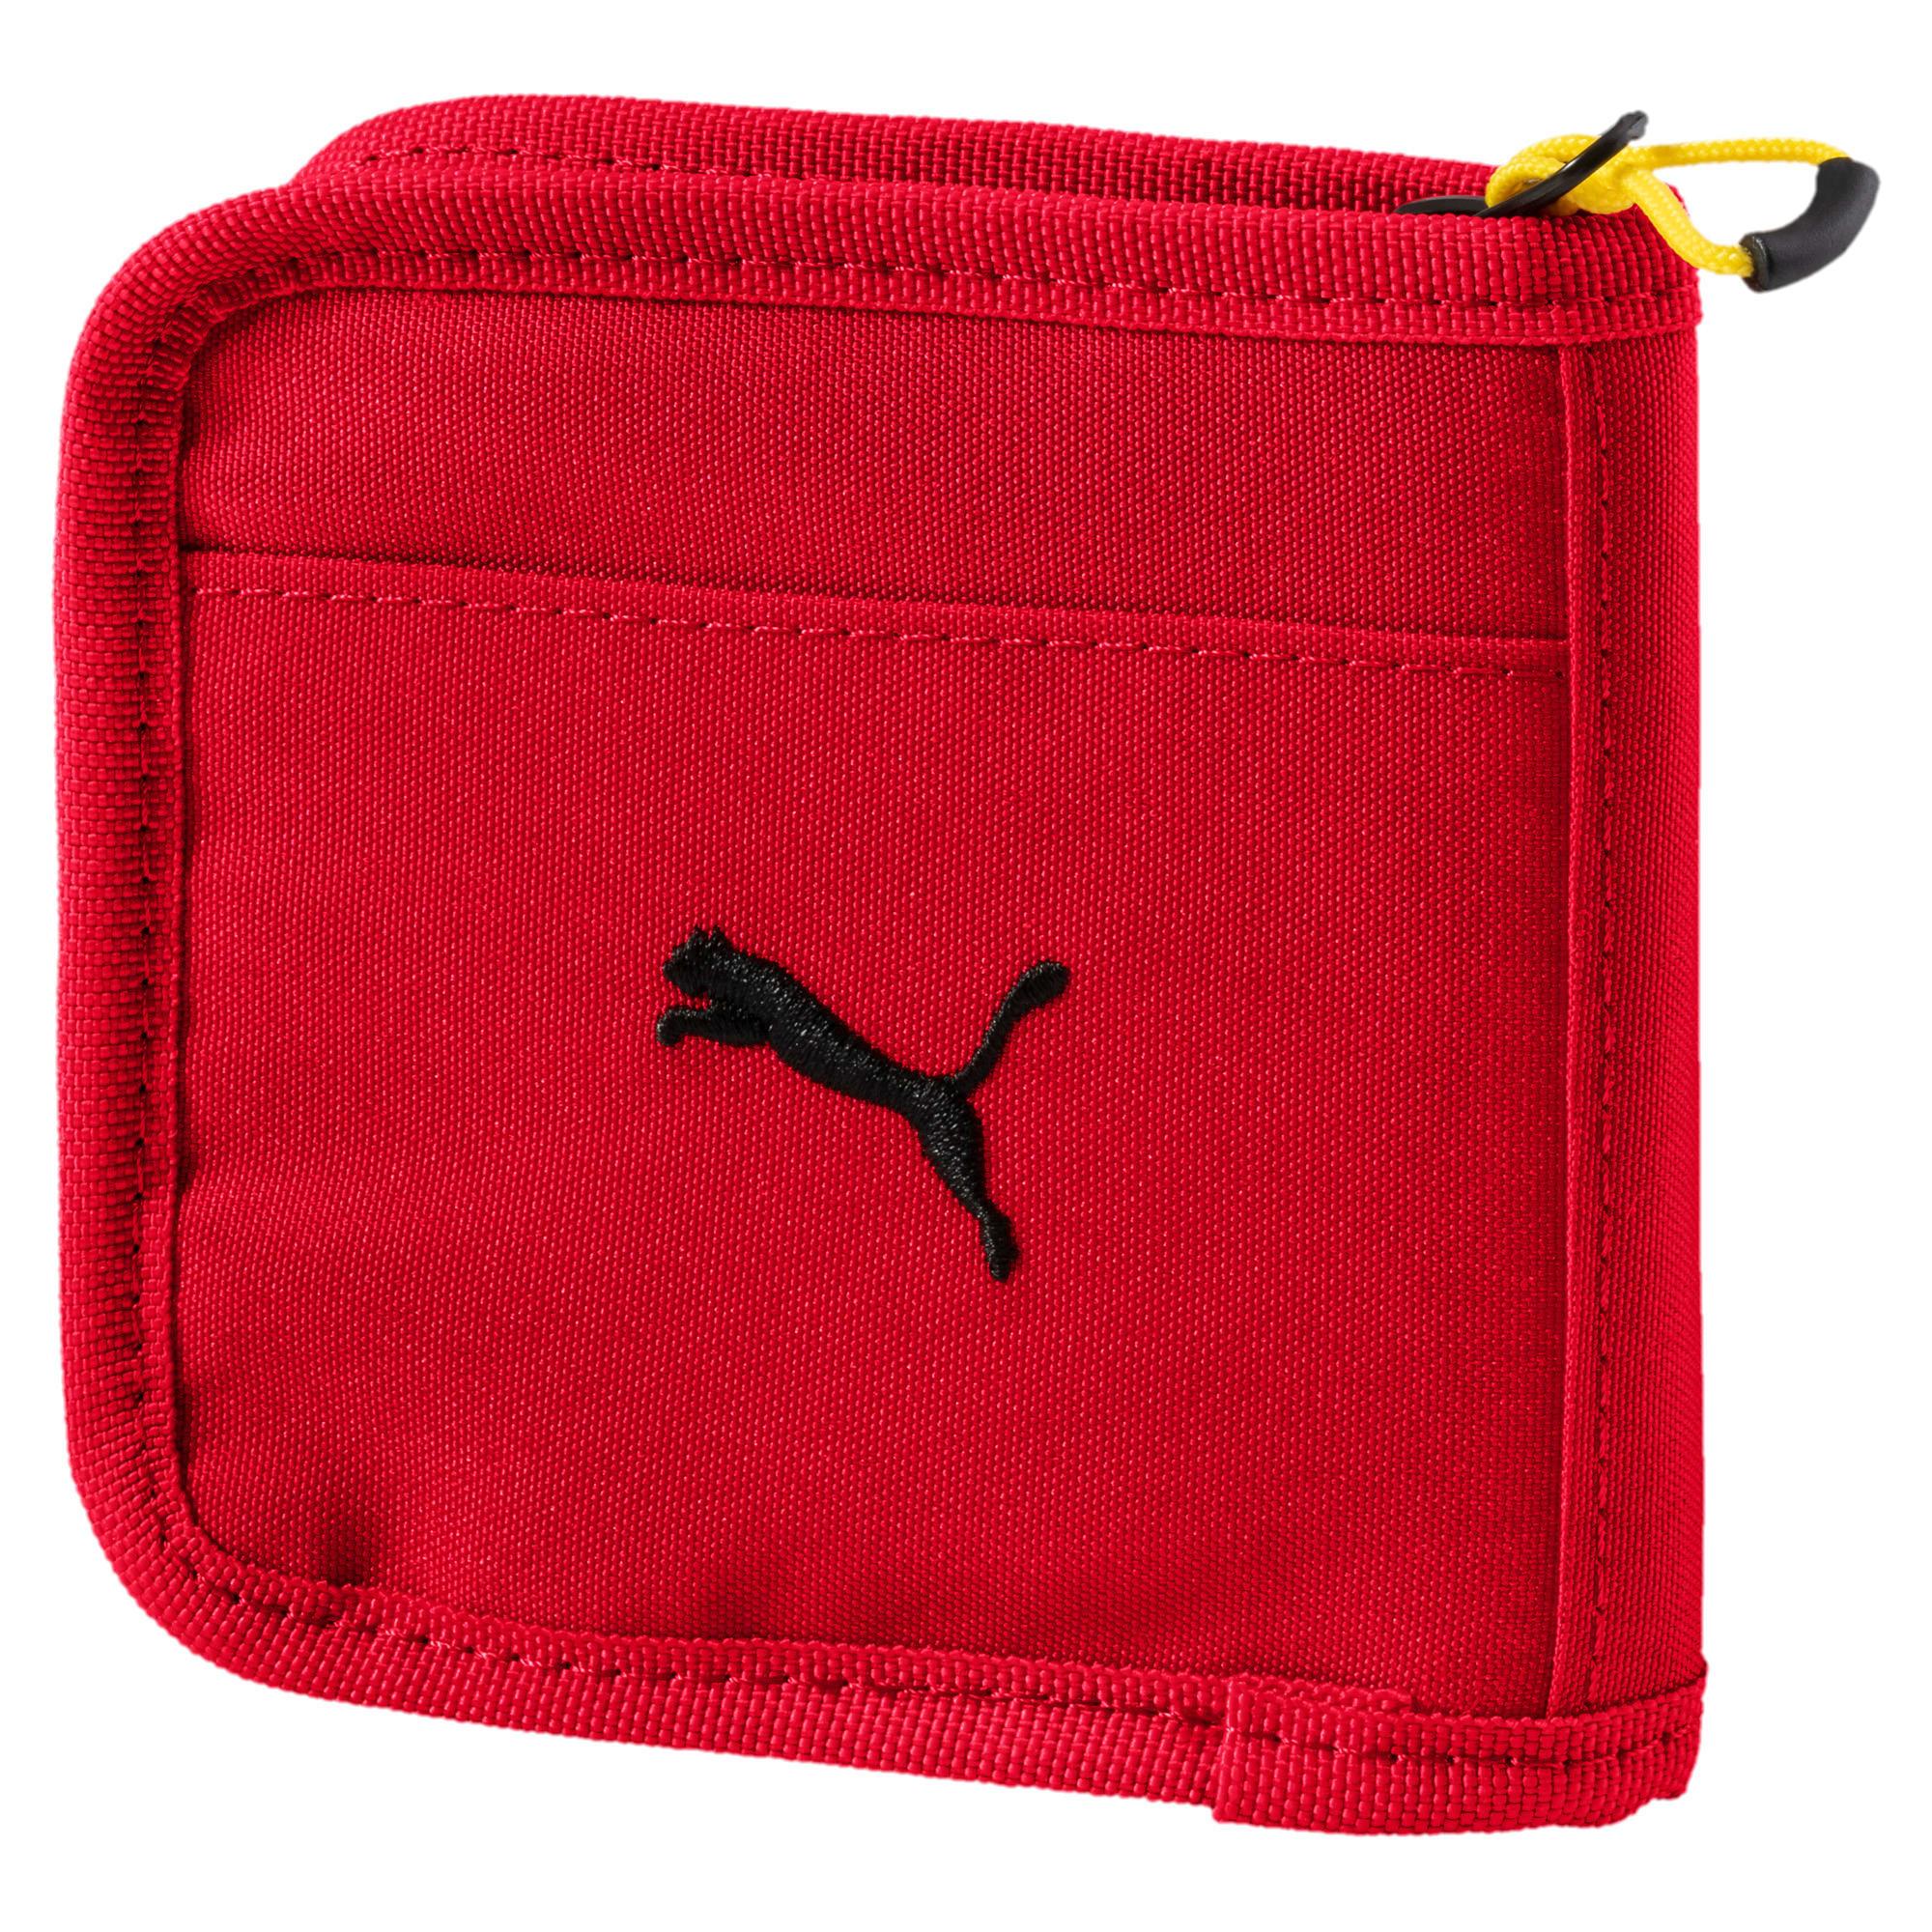 Thumbnail 2 of Ferrari Fanwear Wallet, Rosso Corsa, medium-IND